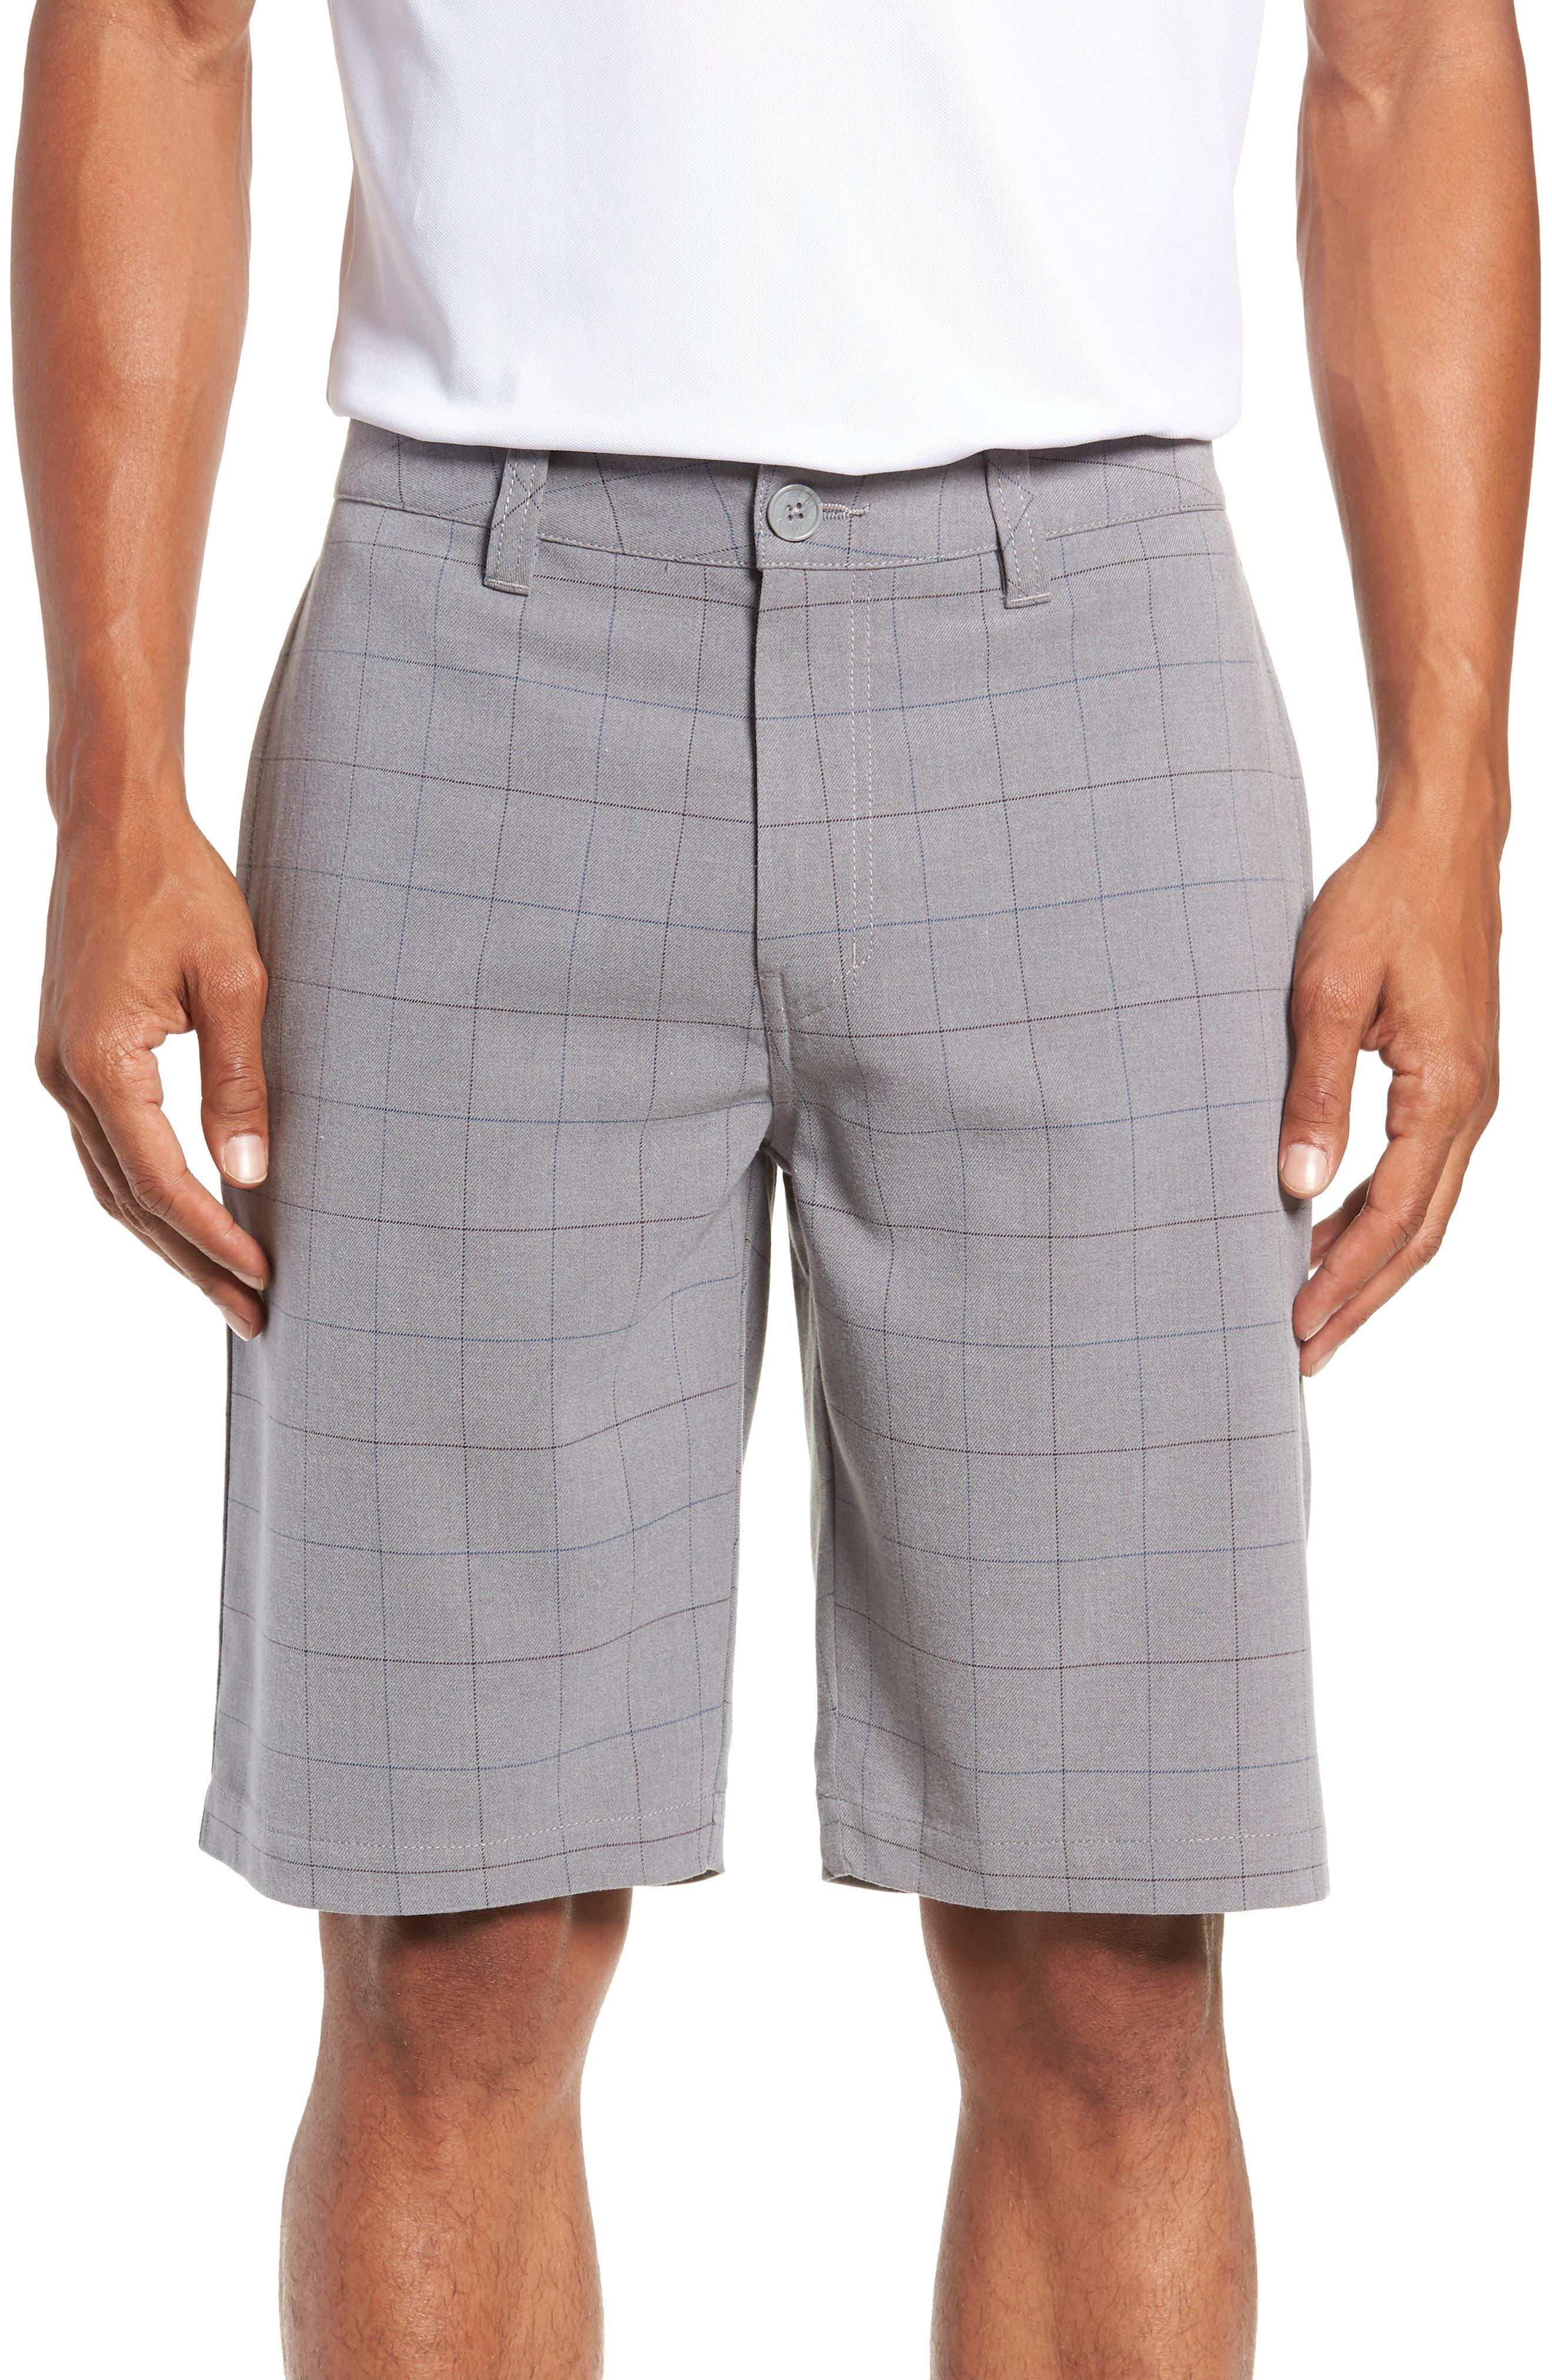 Rickles Regular Fit Shorts,                             Main thumbnail 1, color,                             HEATHER SHARKSKIN